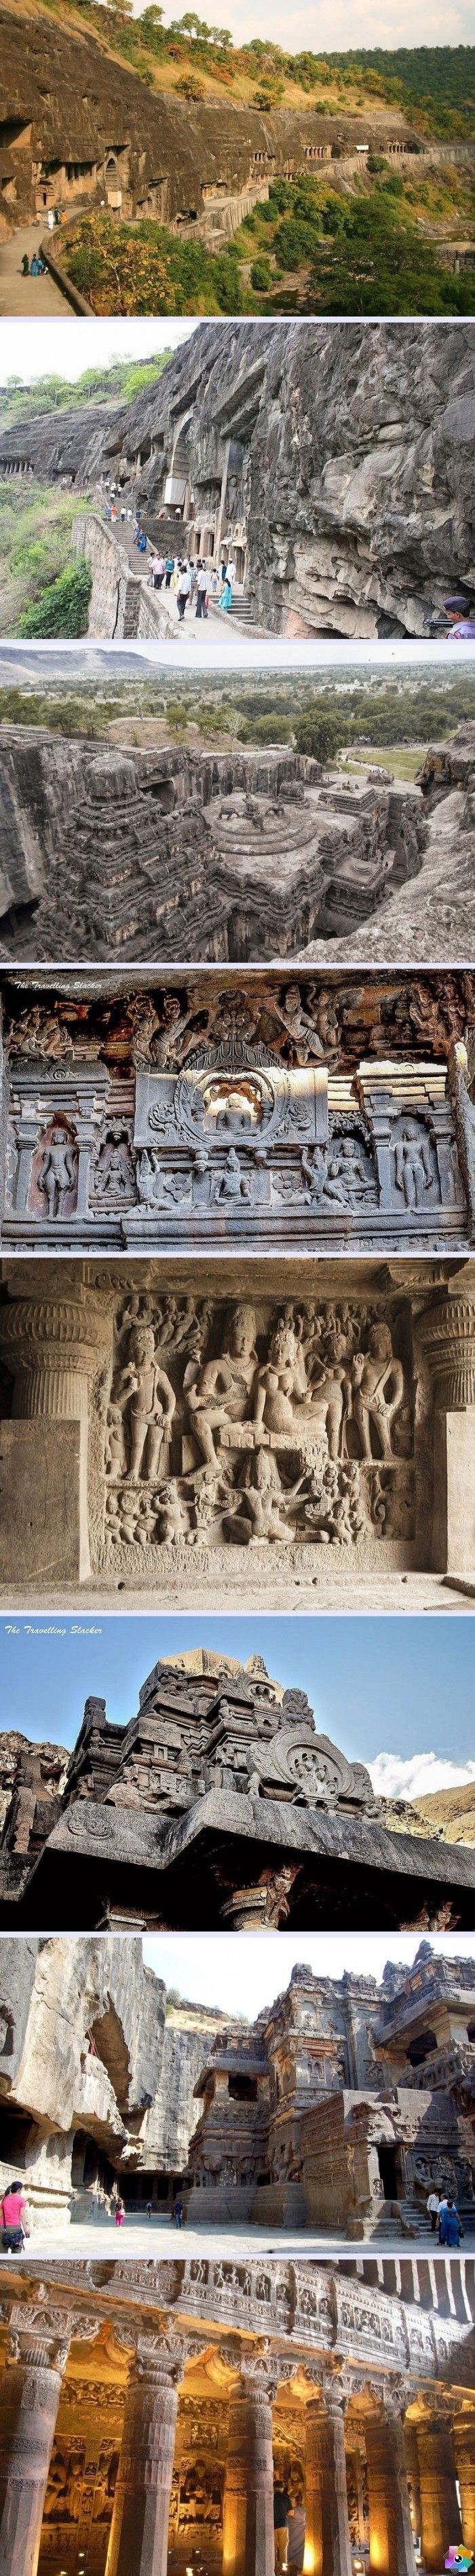 Ajanta ve Ellora Mağaraları - Hindistan www.4finite.com